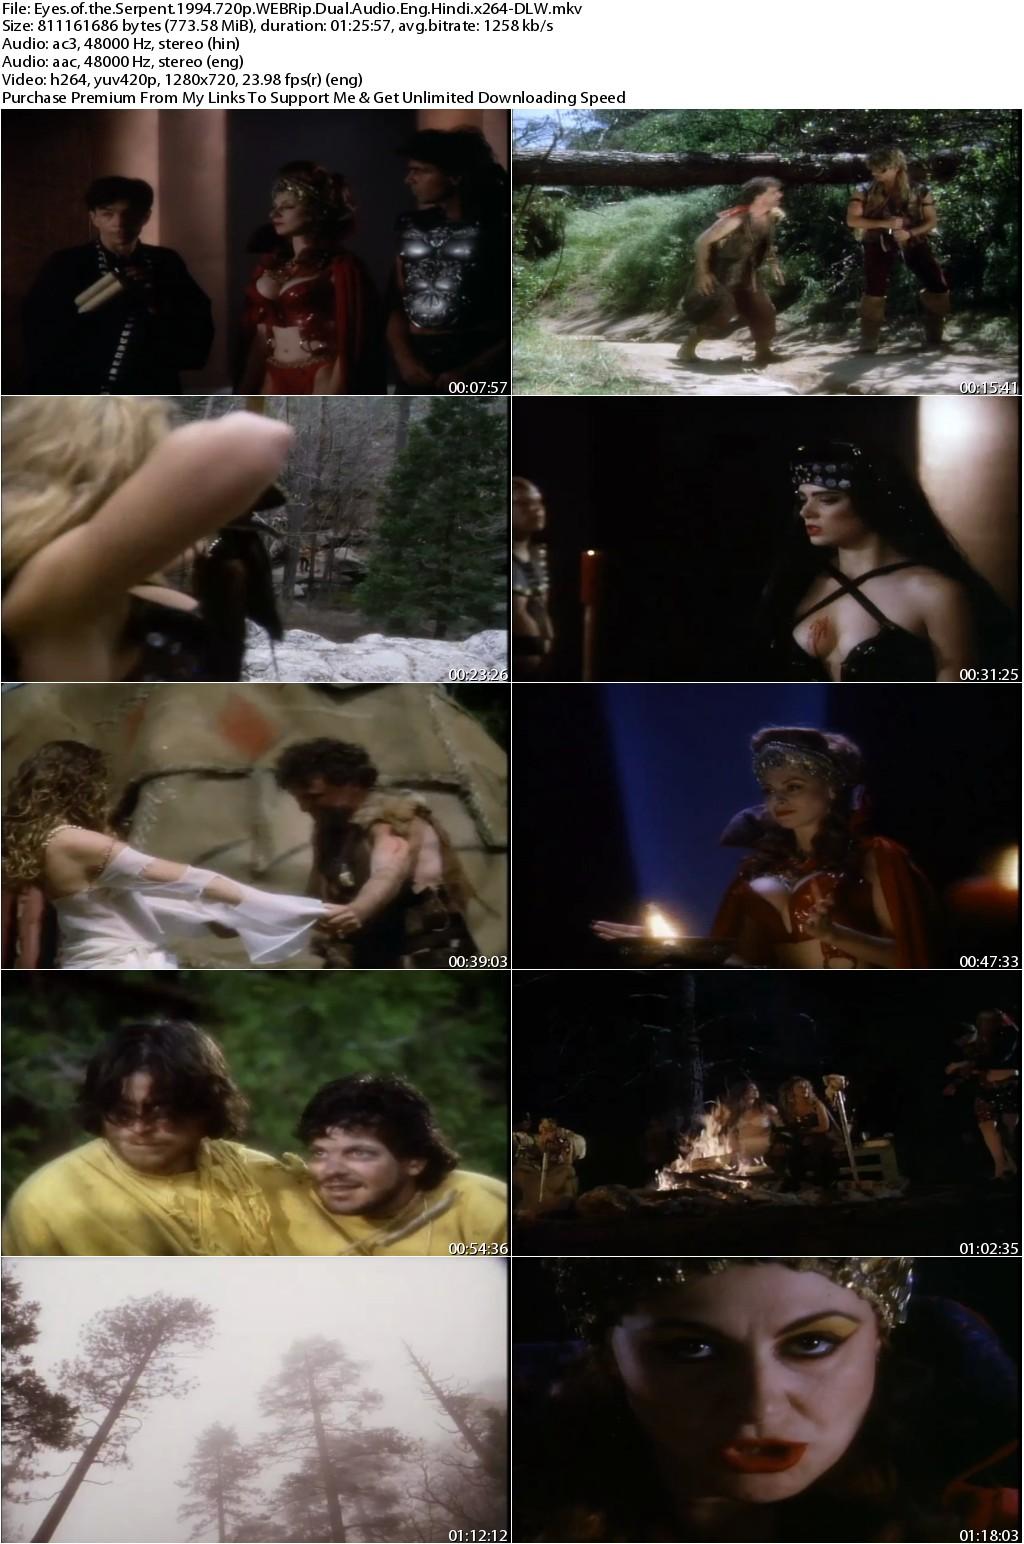 Eyes of the Serpent (1994) 720p WEBRip Dual Audio Eng Hindi x264-DLW